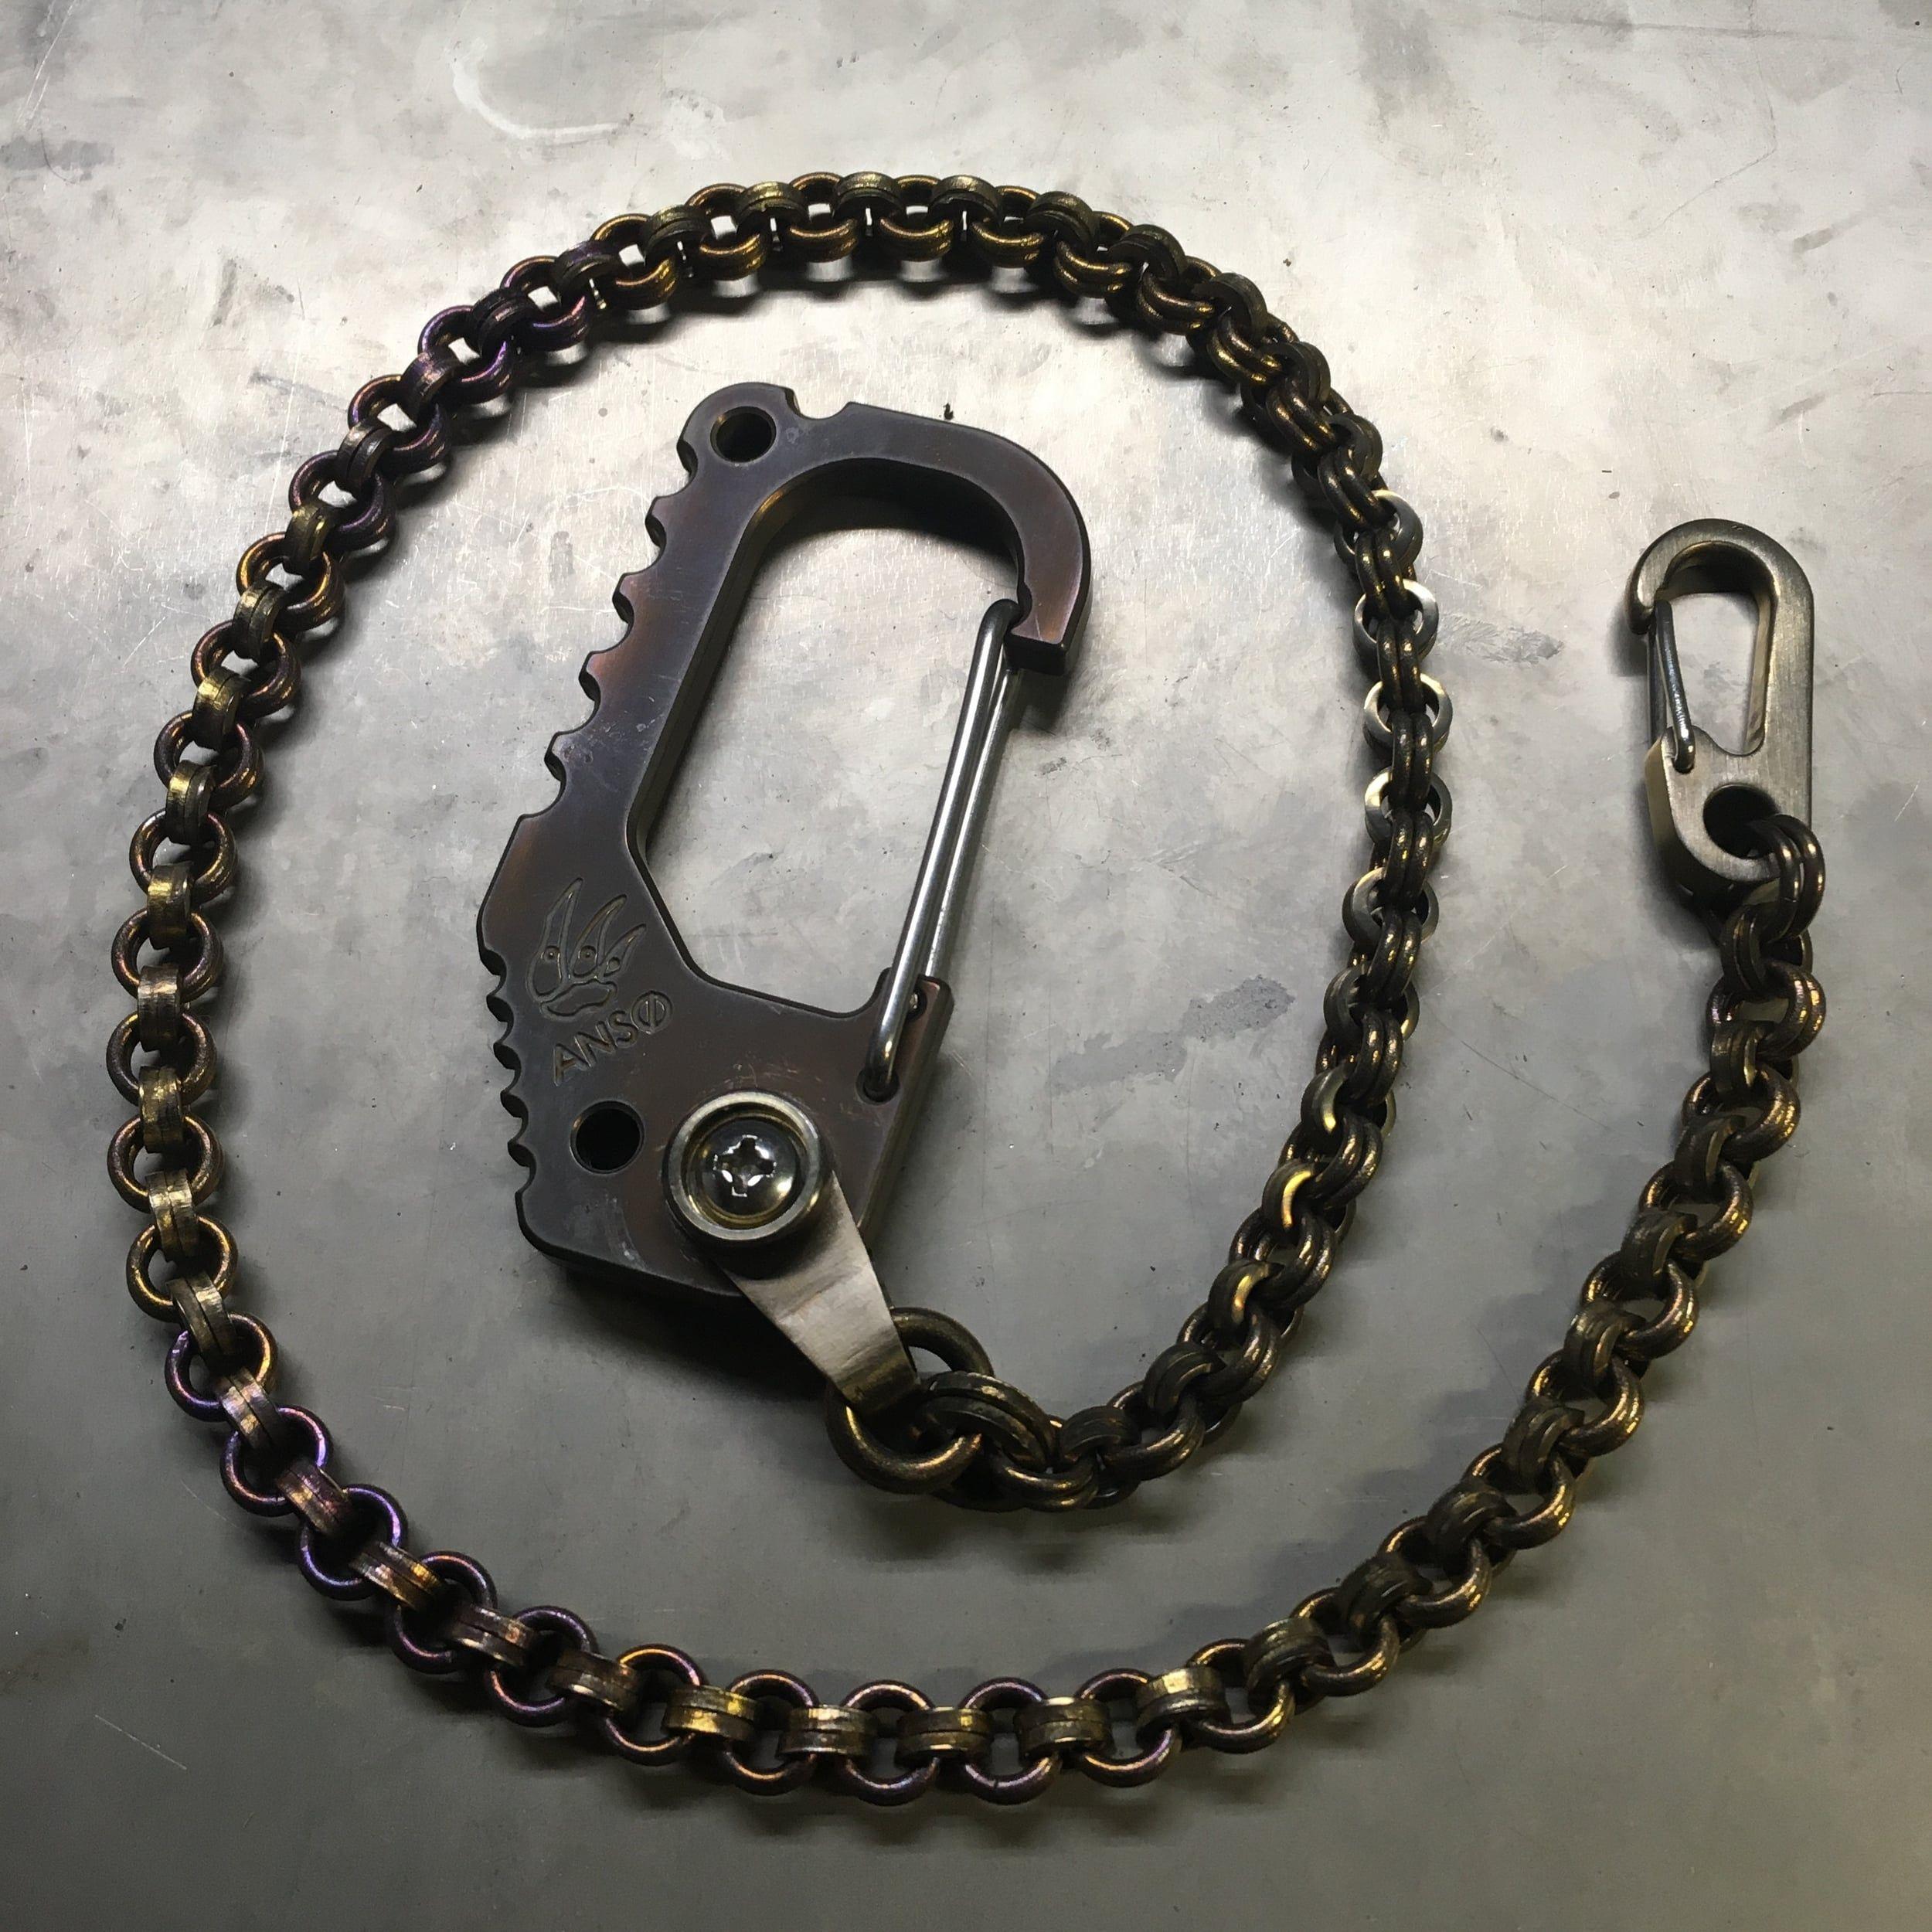 Anso  Titanium Carabiner Wallet Chain